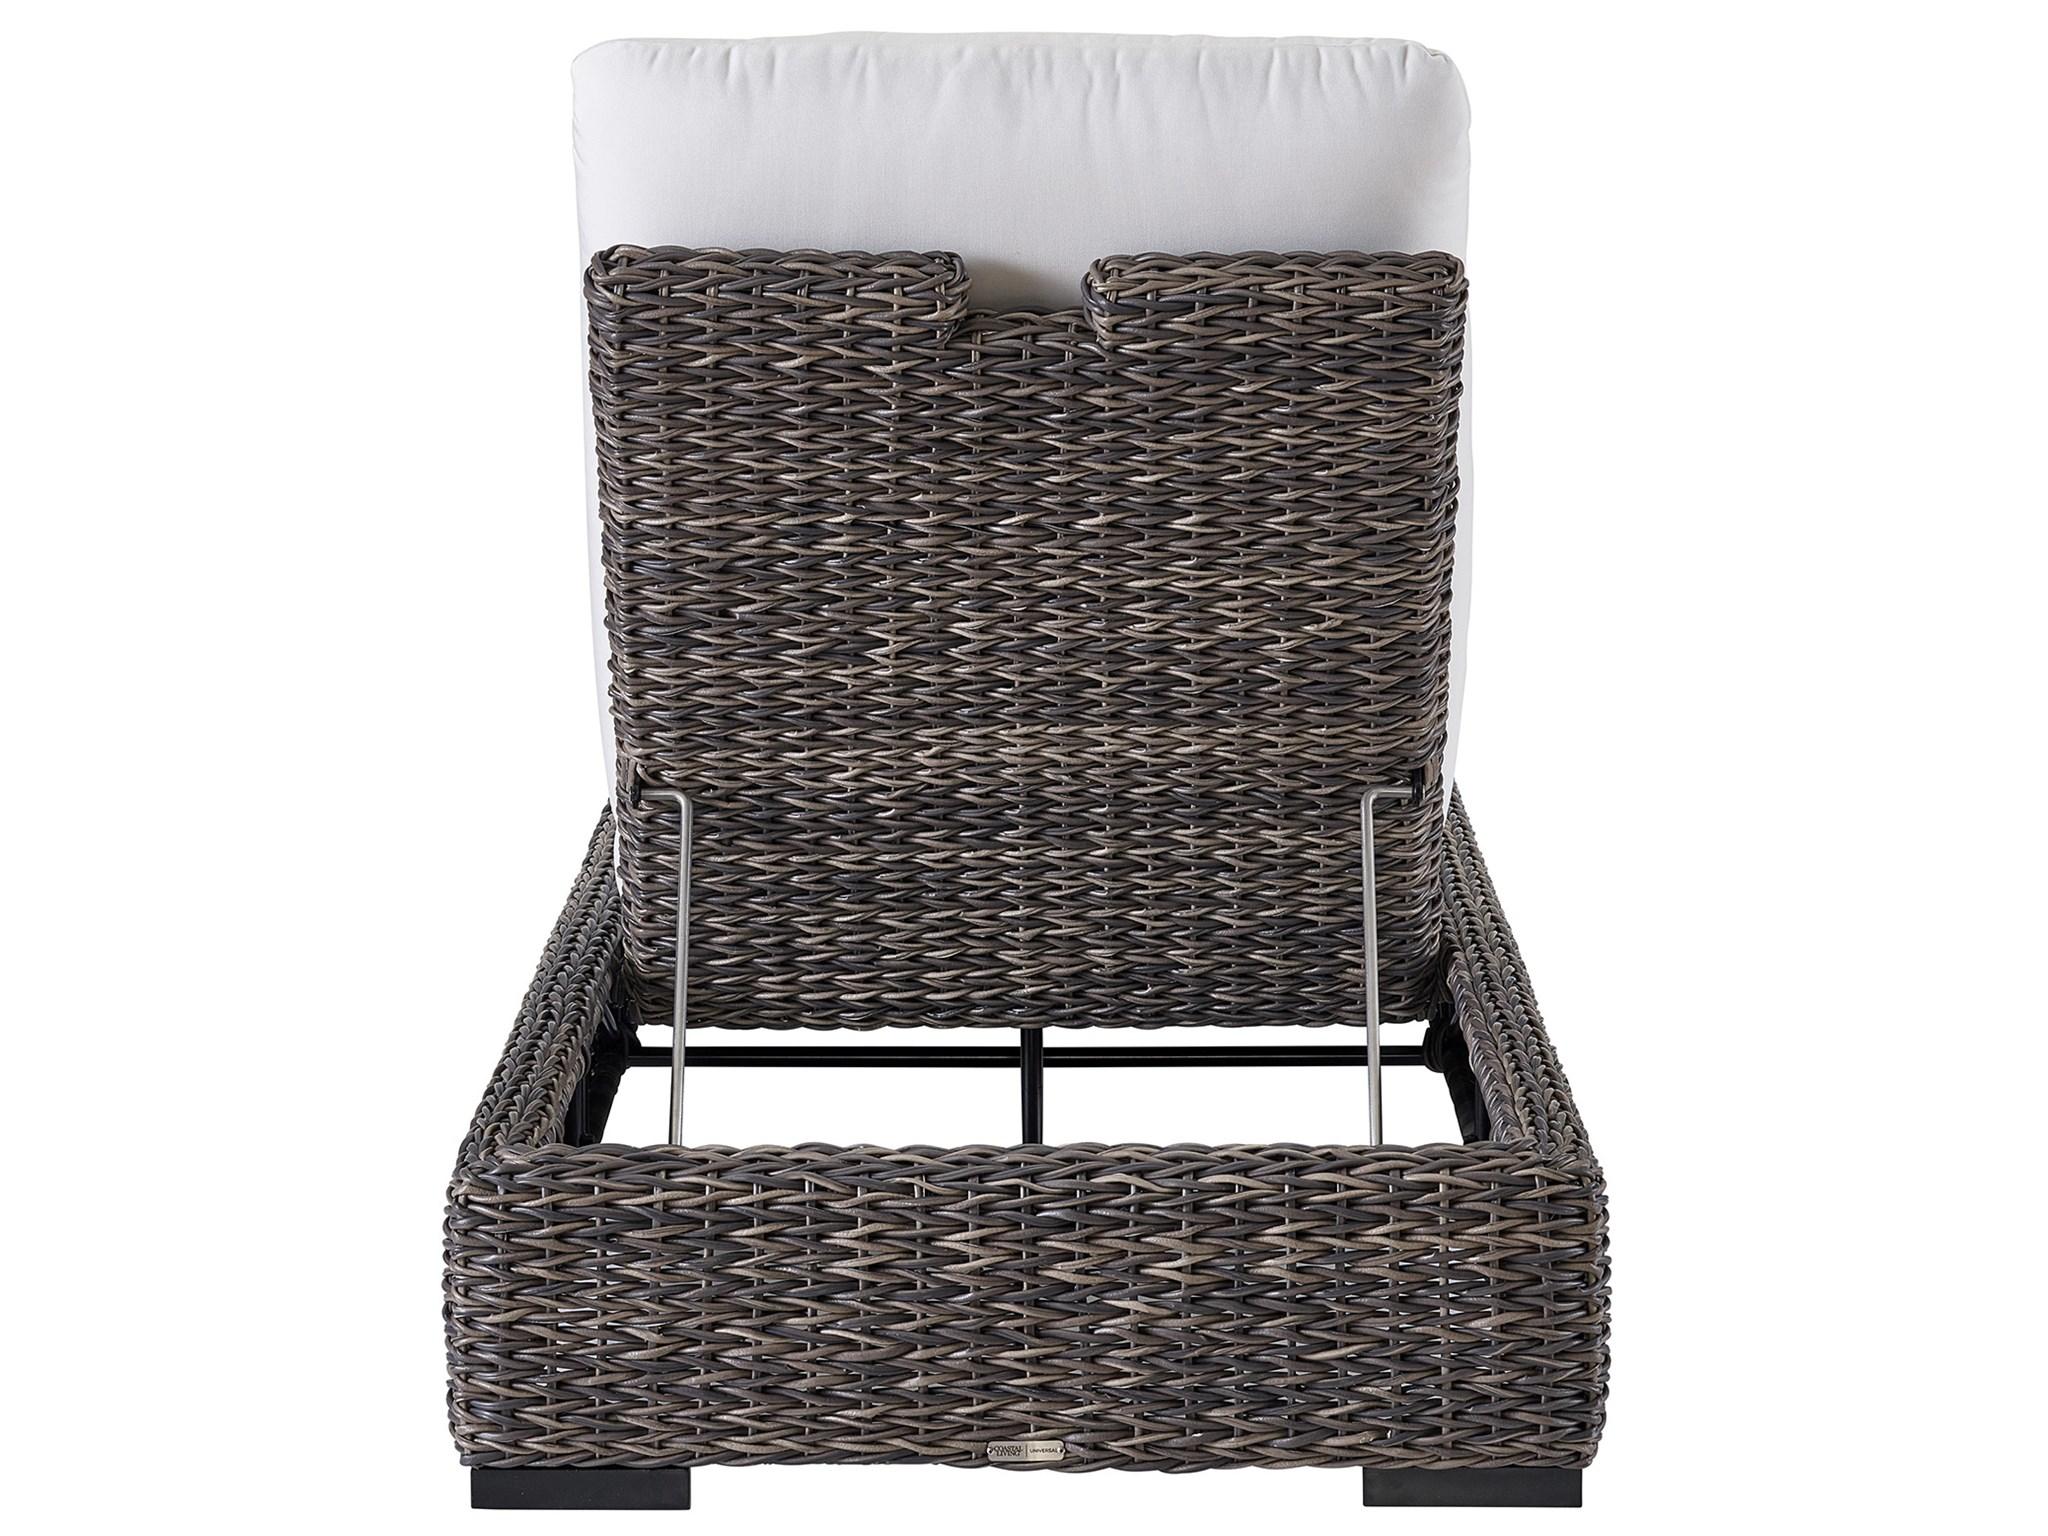 Montauk Chaise Lounge